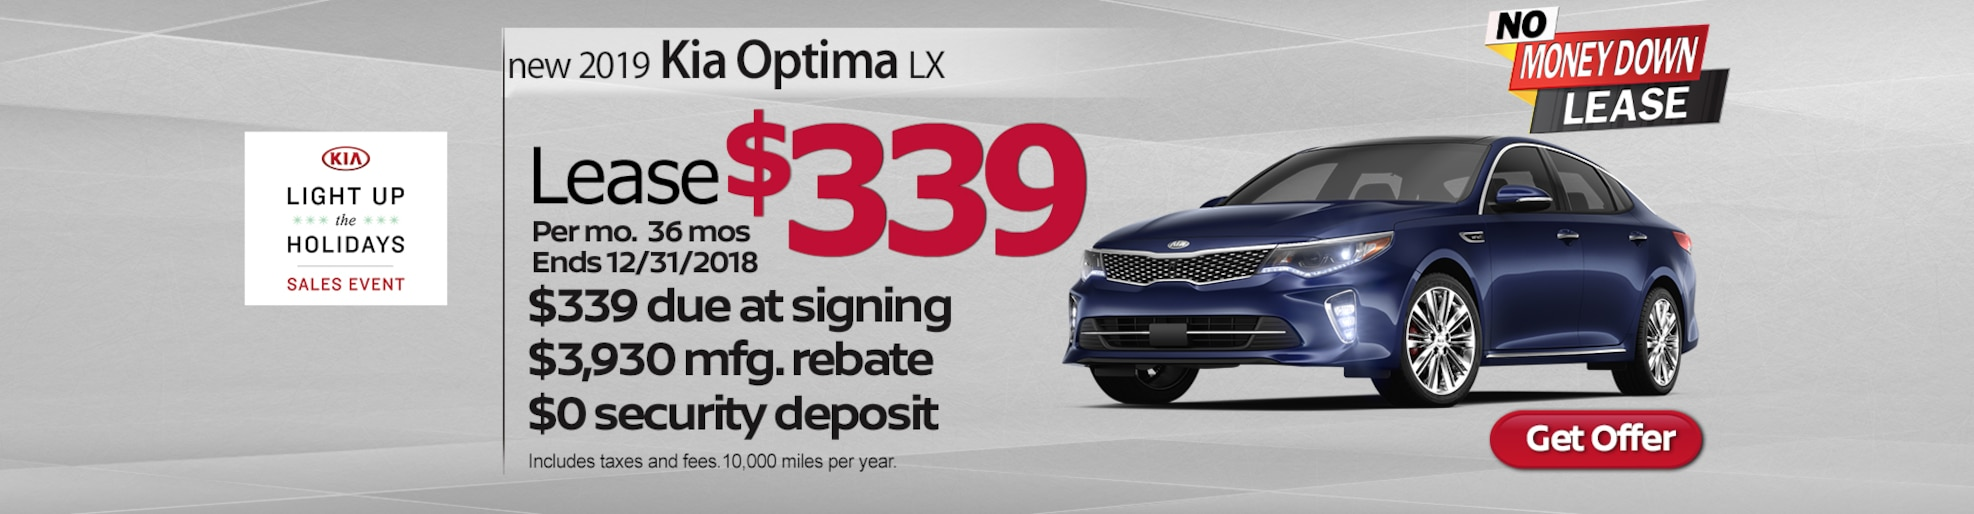 Toyota Dealership Dayton Ohio >> Jeff Wyler Springfield Auto Mall | New and Used Chevrolet ...